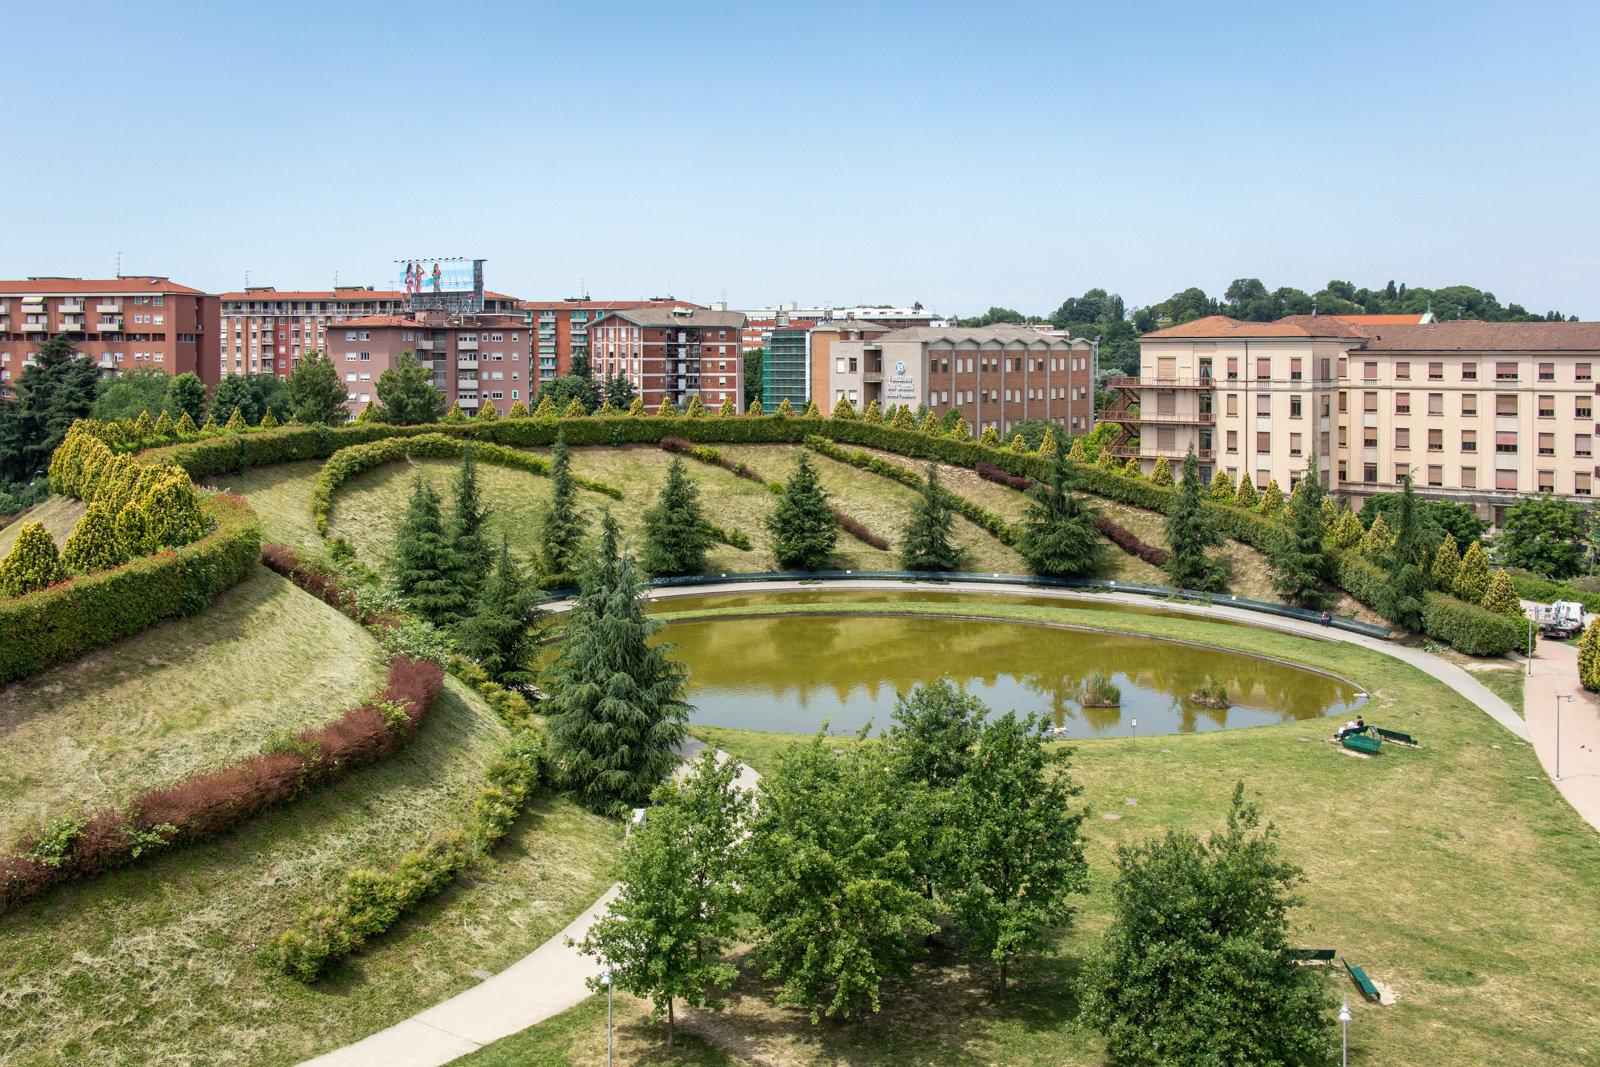 VERDE - Milano Photofestival